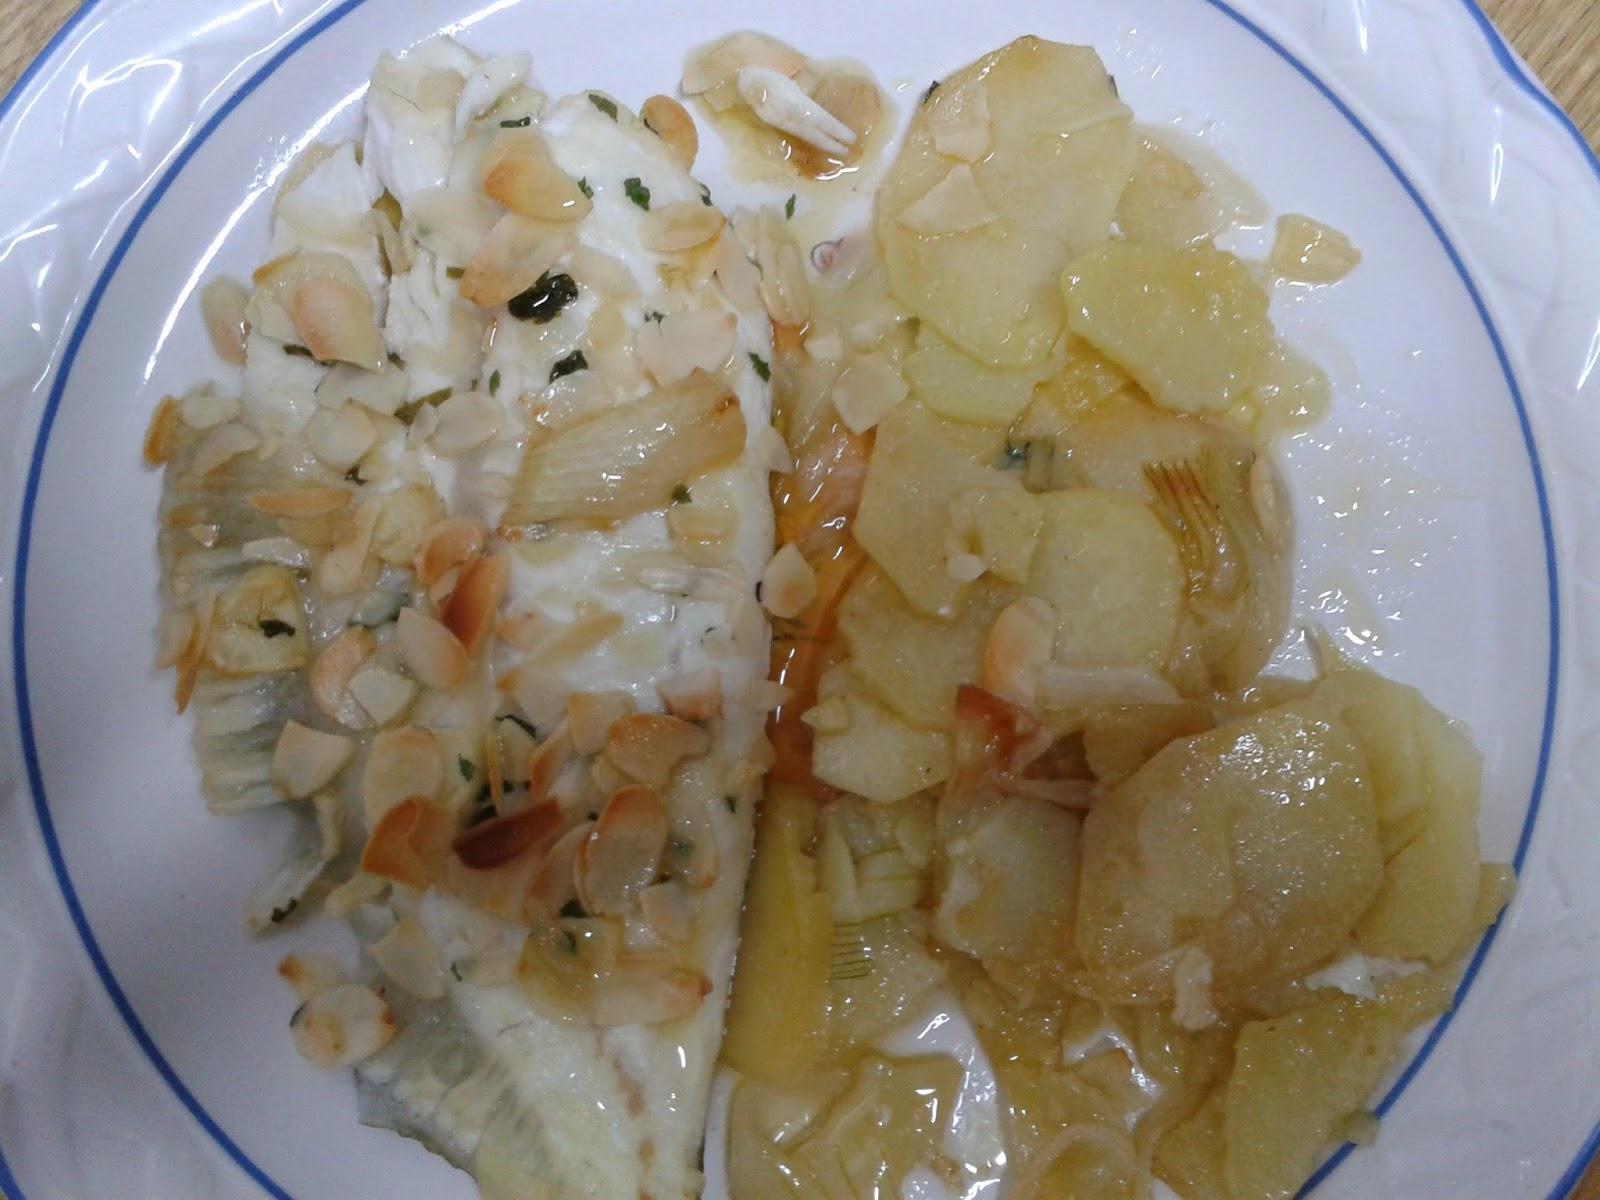 Como Cocinar El Rodaballo | La Cocina De Beli Rodaballo Al Horno Con Almendras